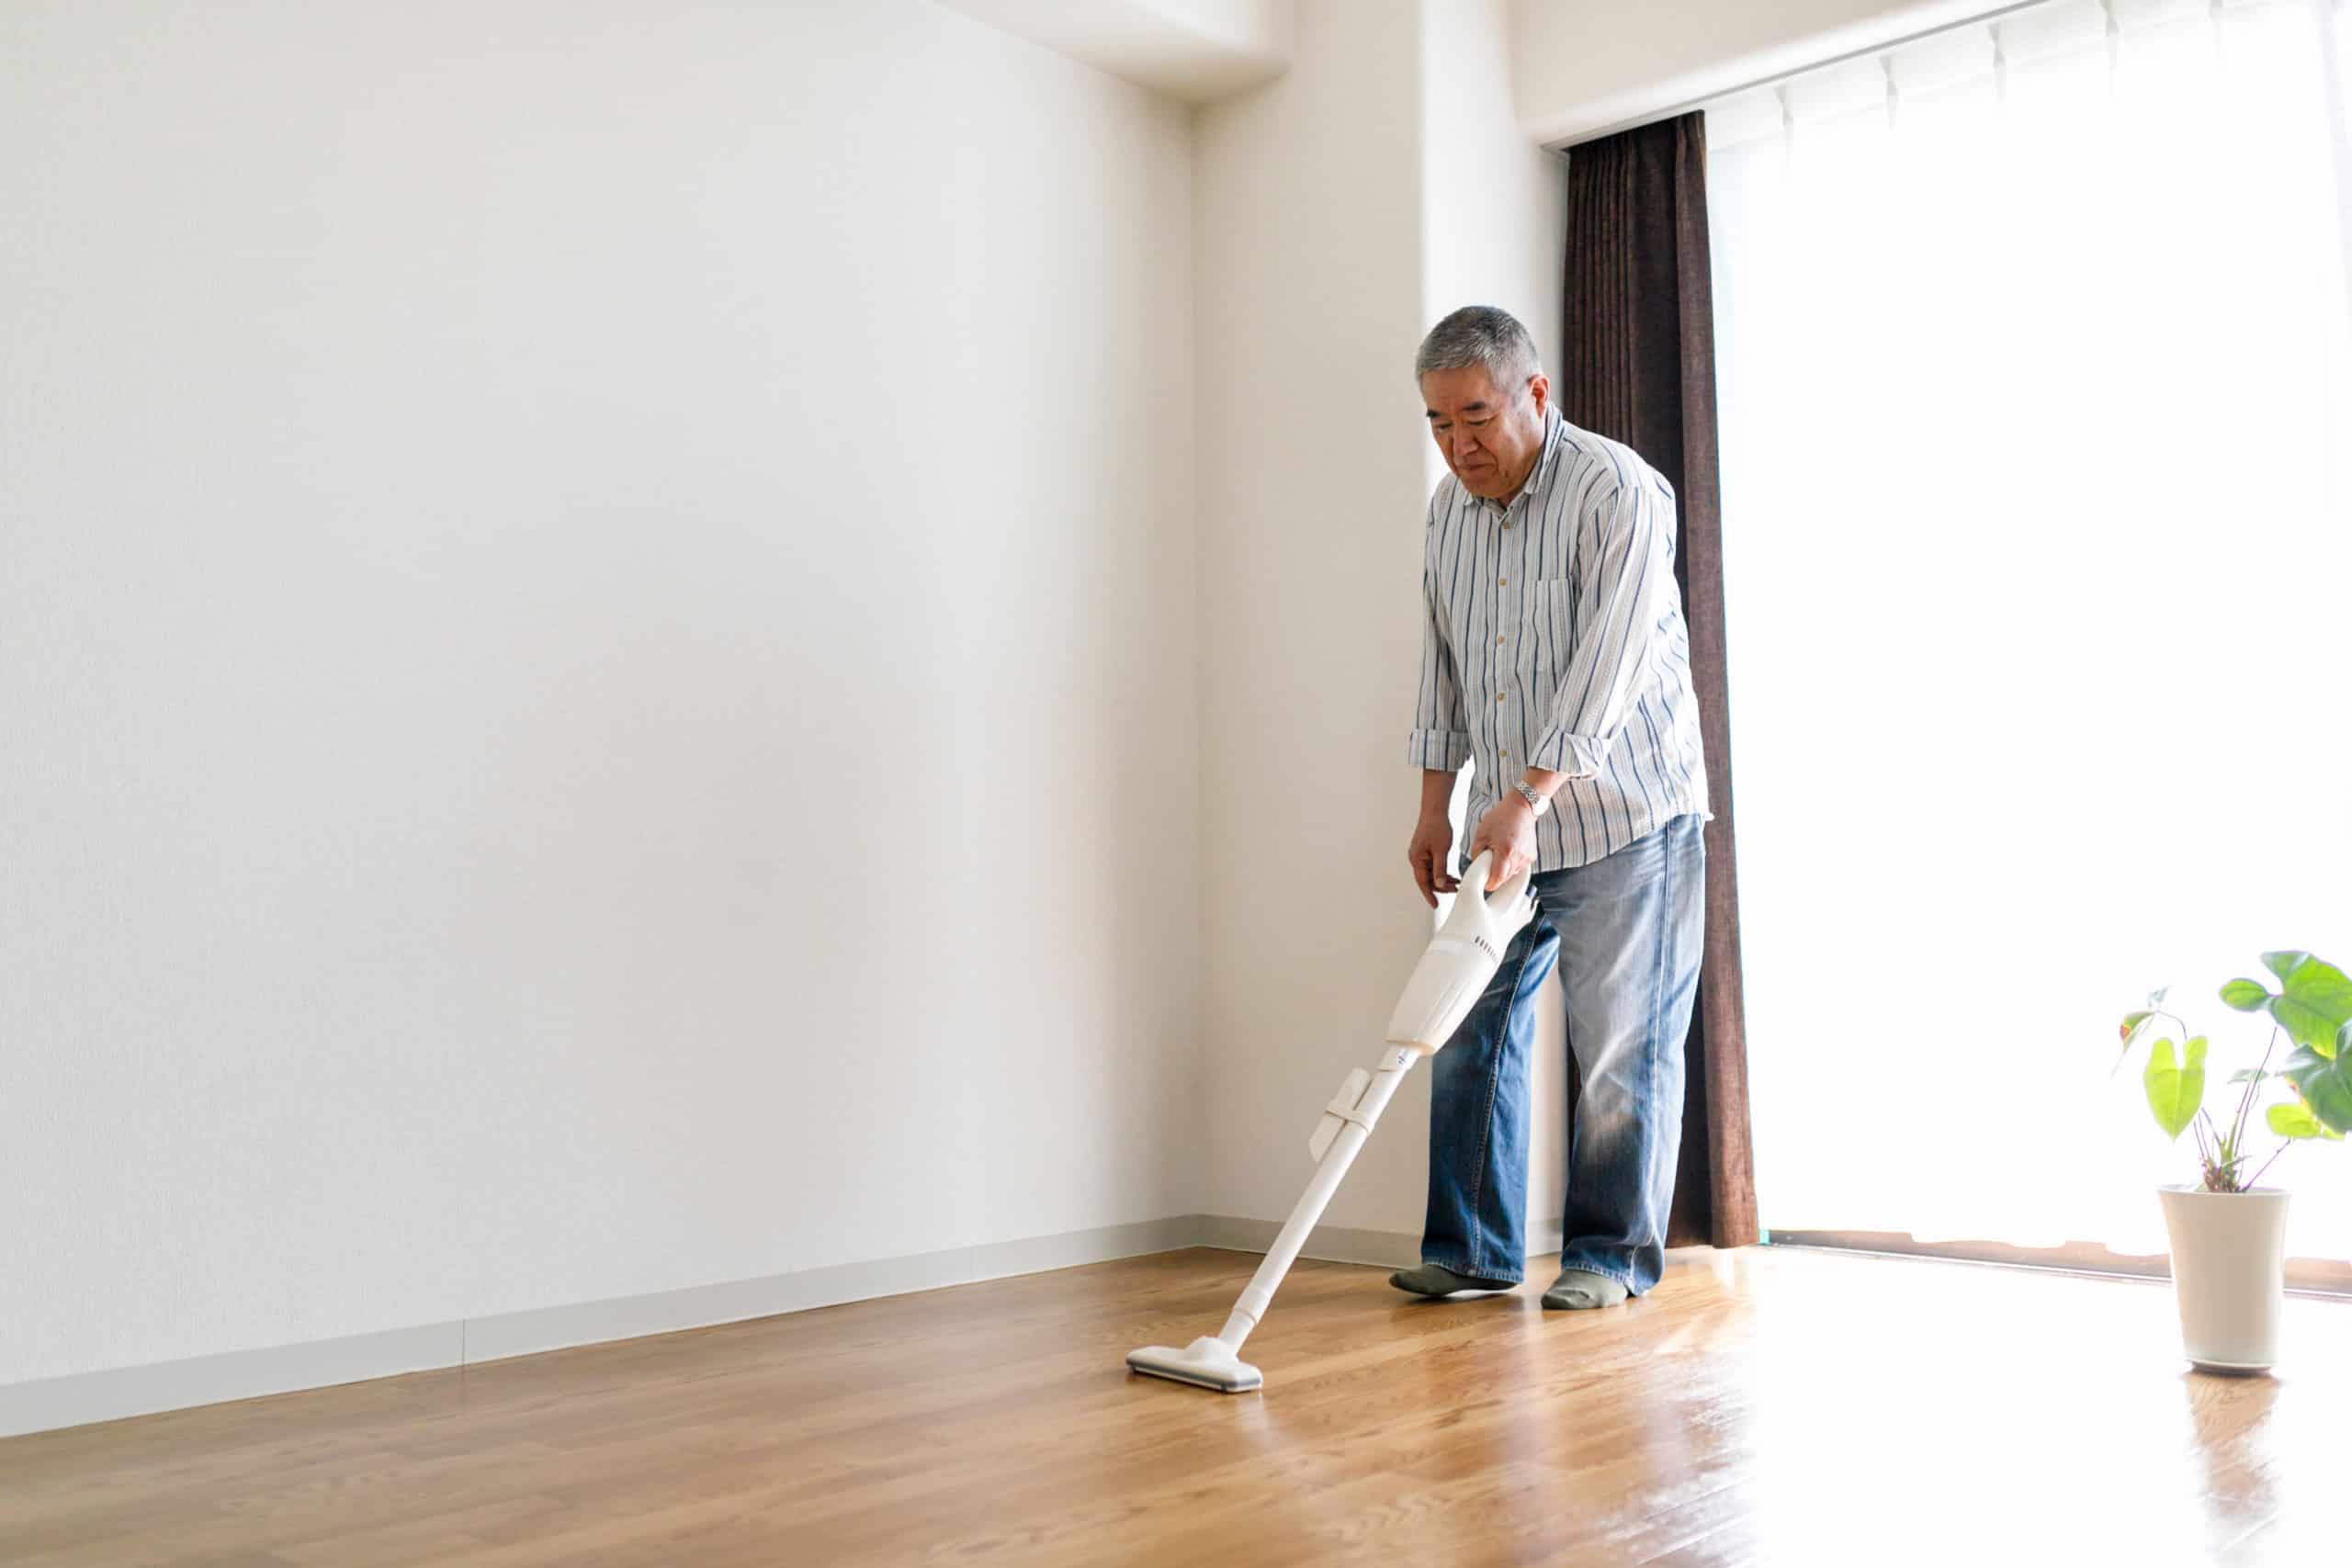 Senior men cleaning